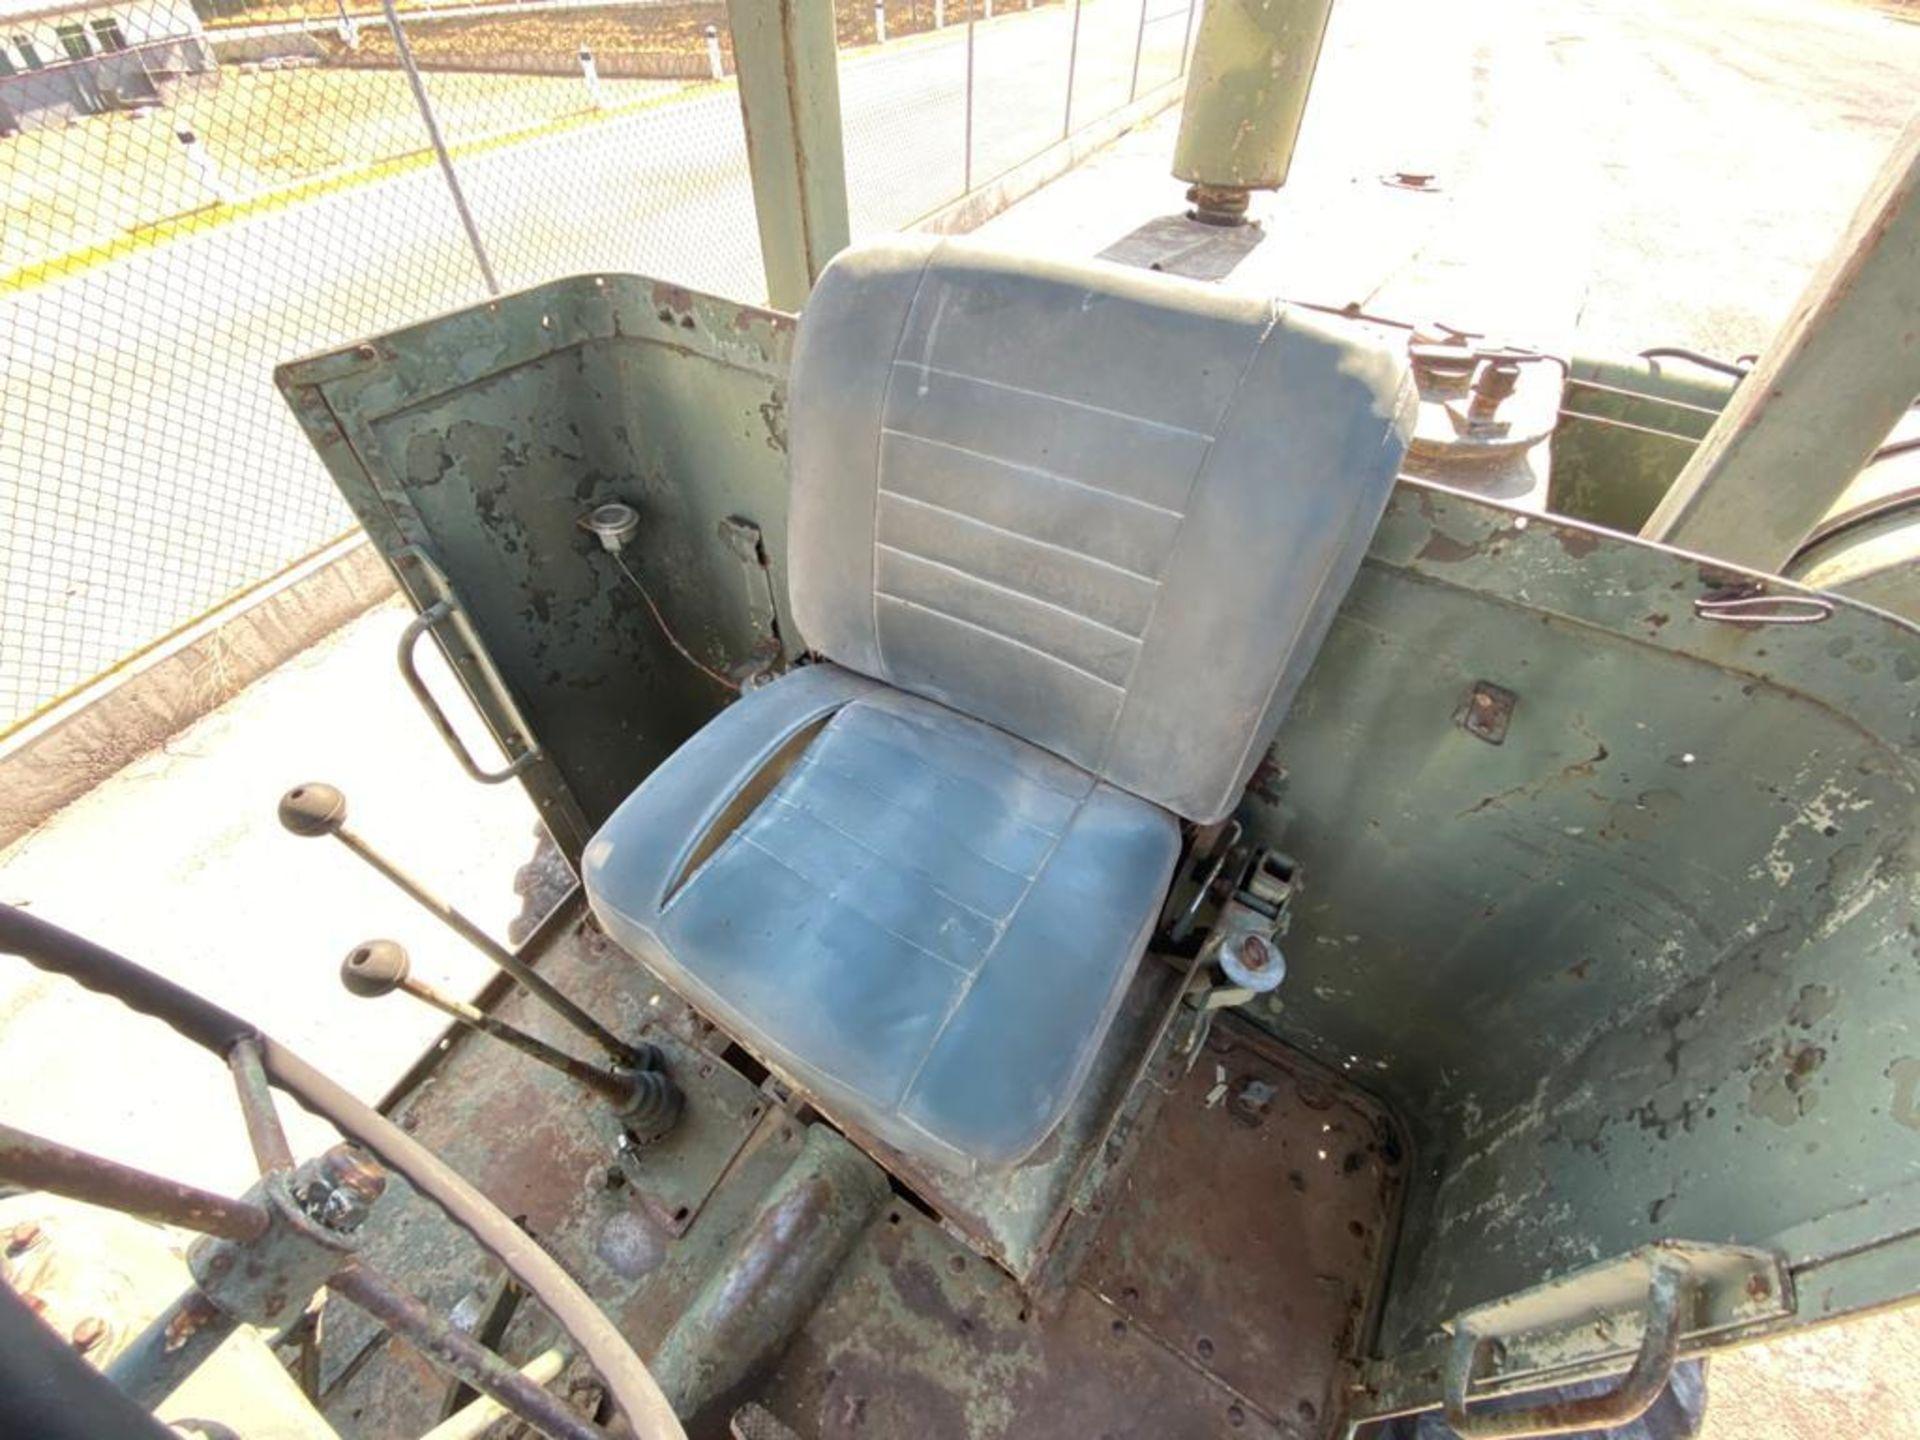 1970 Wabco4 440H Motor Grader, Serial number 440HAGM1398, Motor number 4A156316*RC*4057C - Image 40 of 77